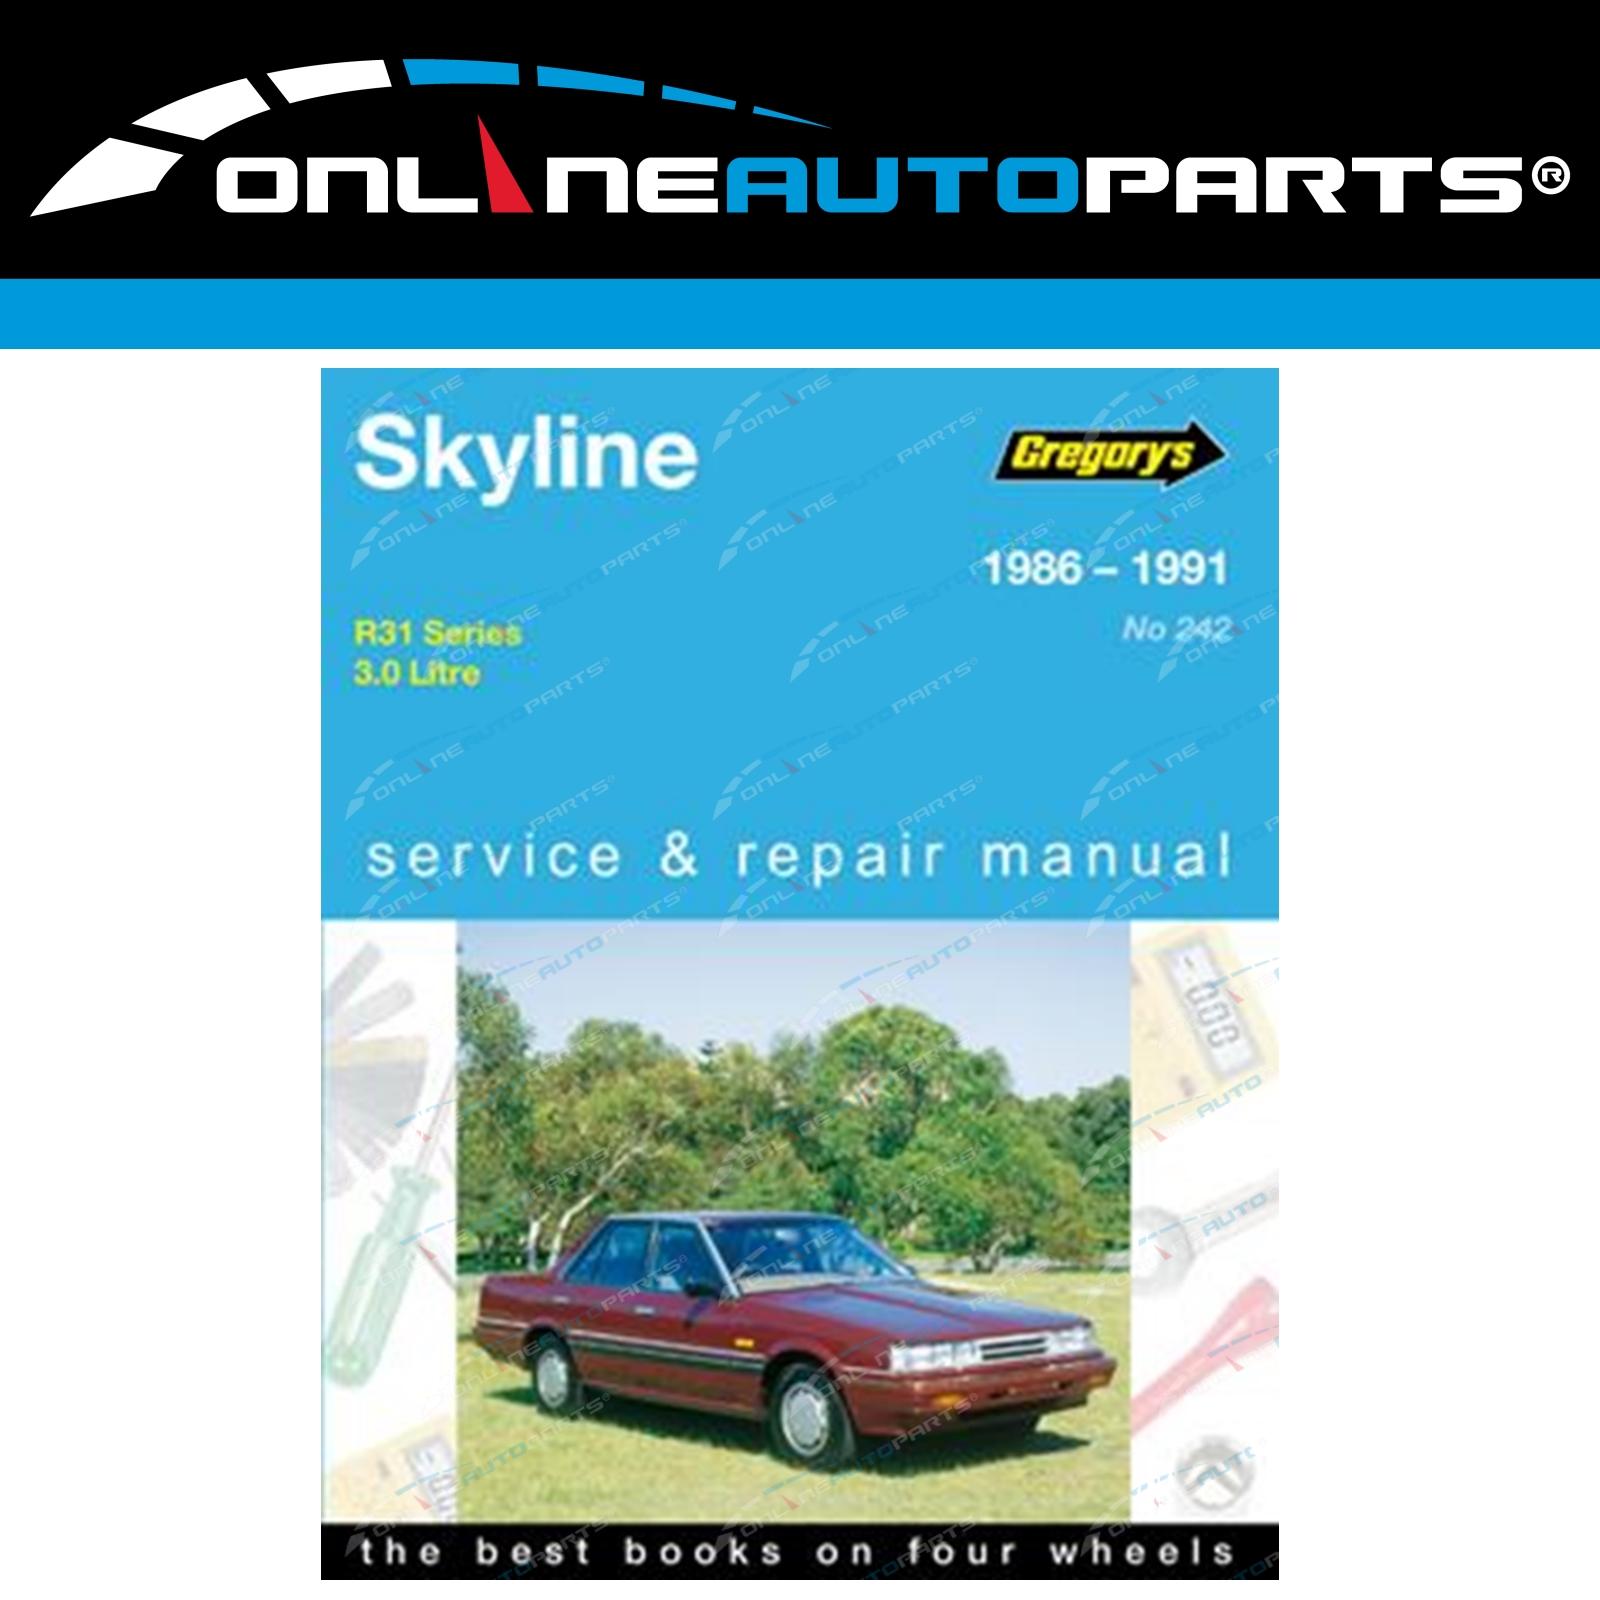 Gregory's Workshop Repair Manual Book for Nissan Skyline R31 3.0 RB30  1986~1991